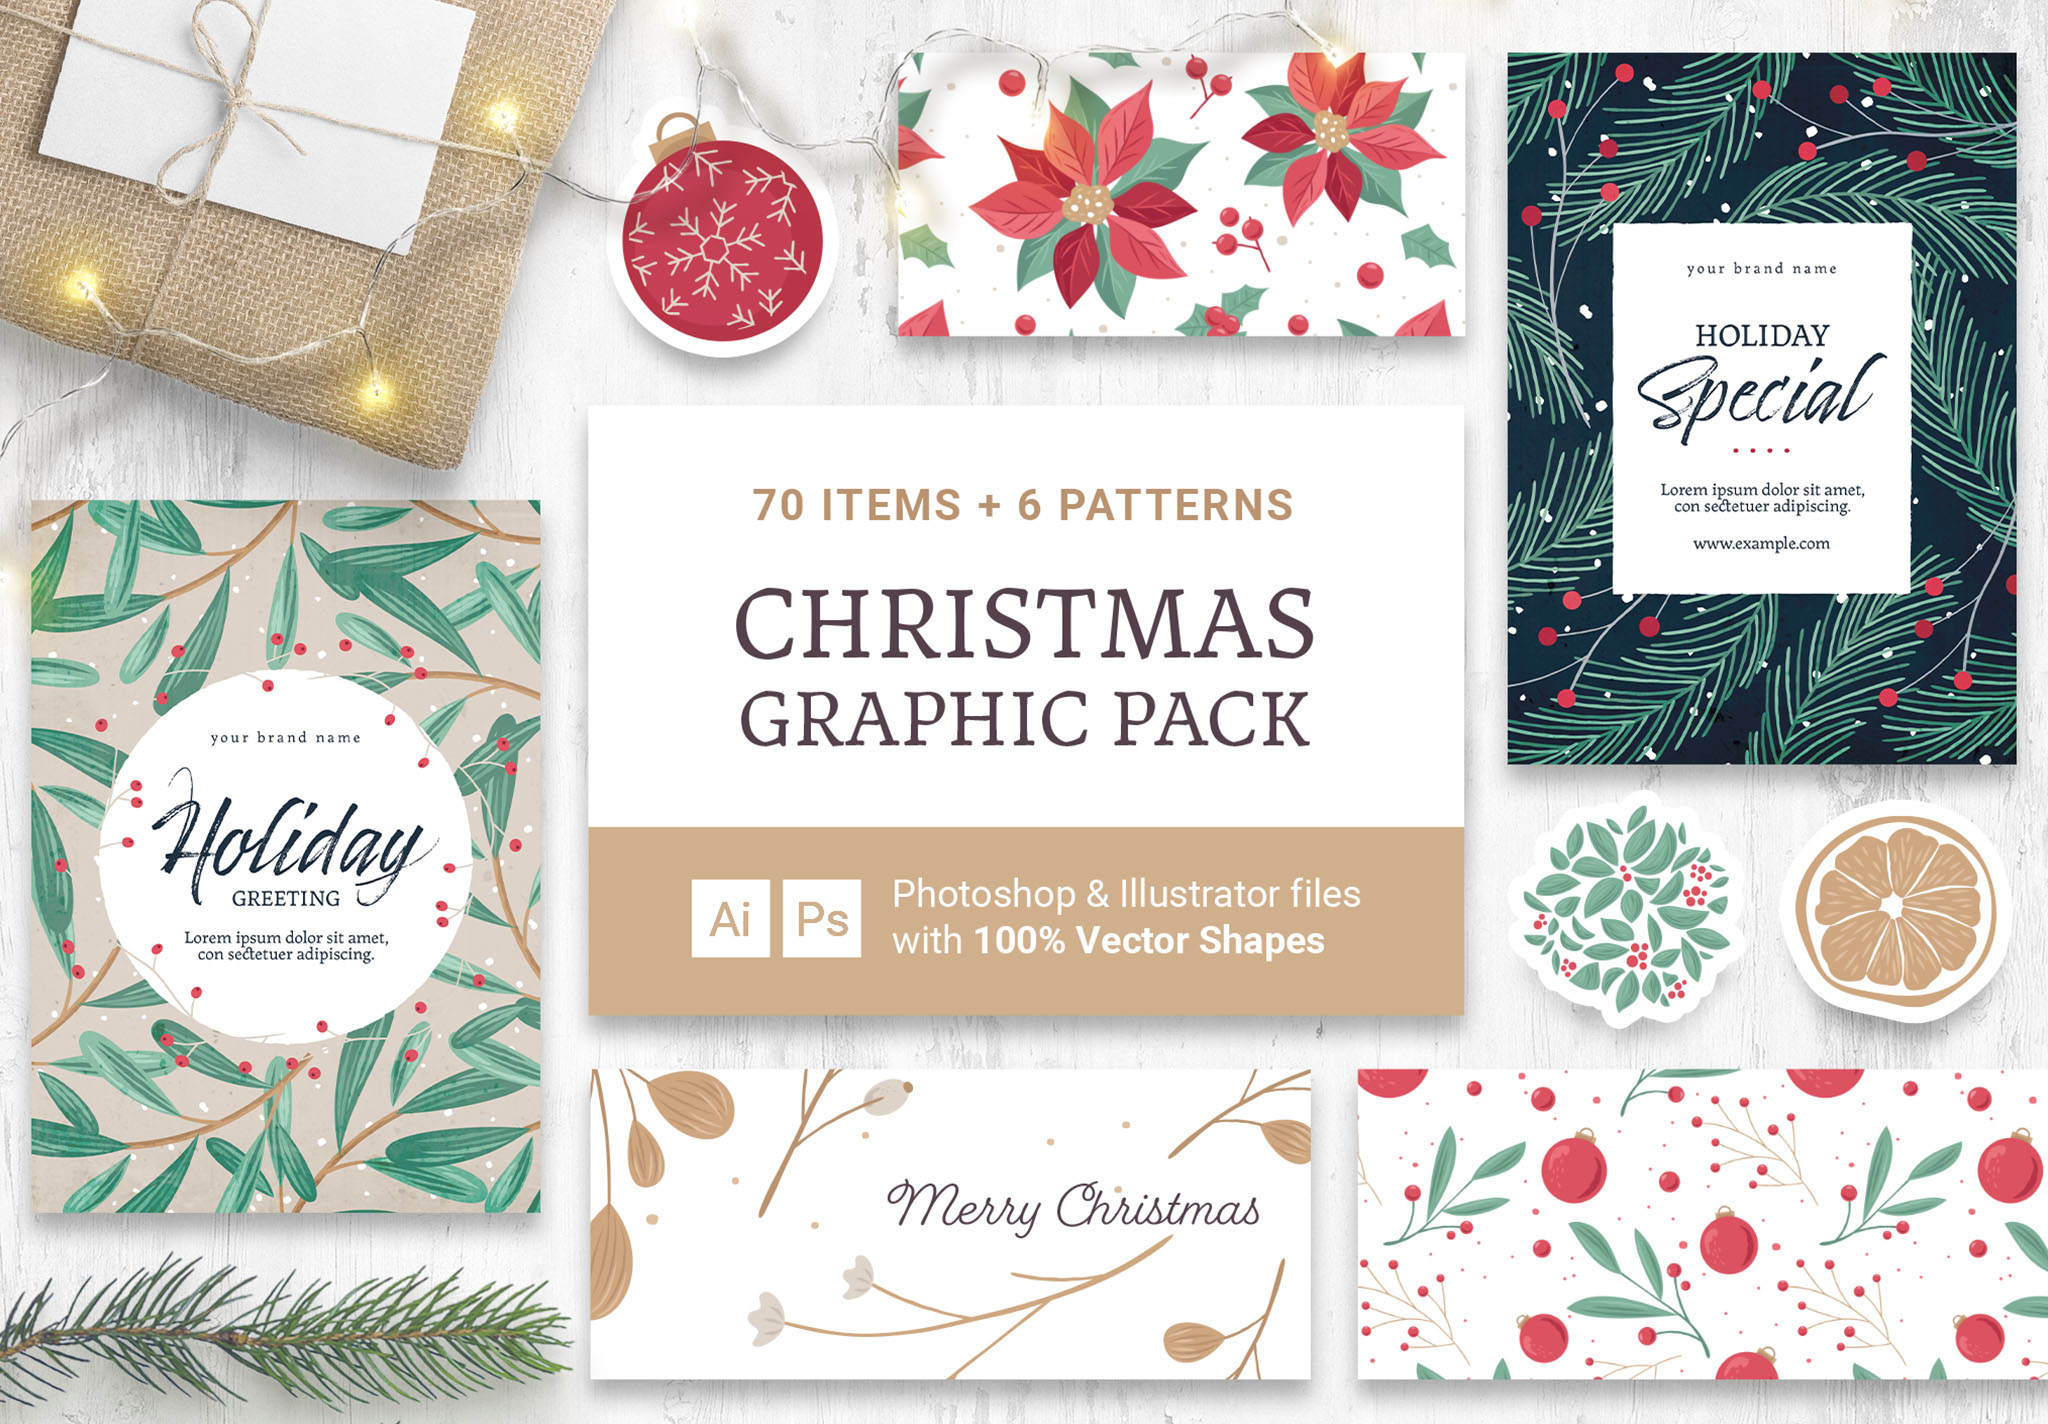 Festive Christmas Vector Graphics for Photoshop & Illustrator